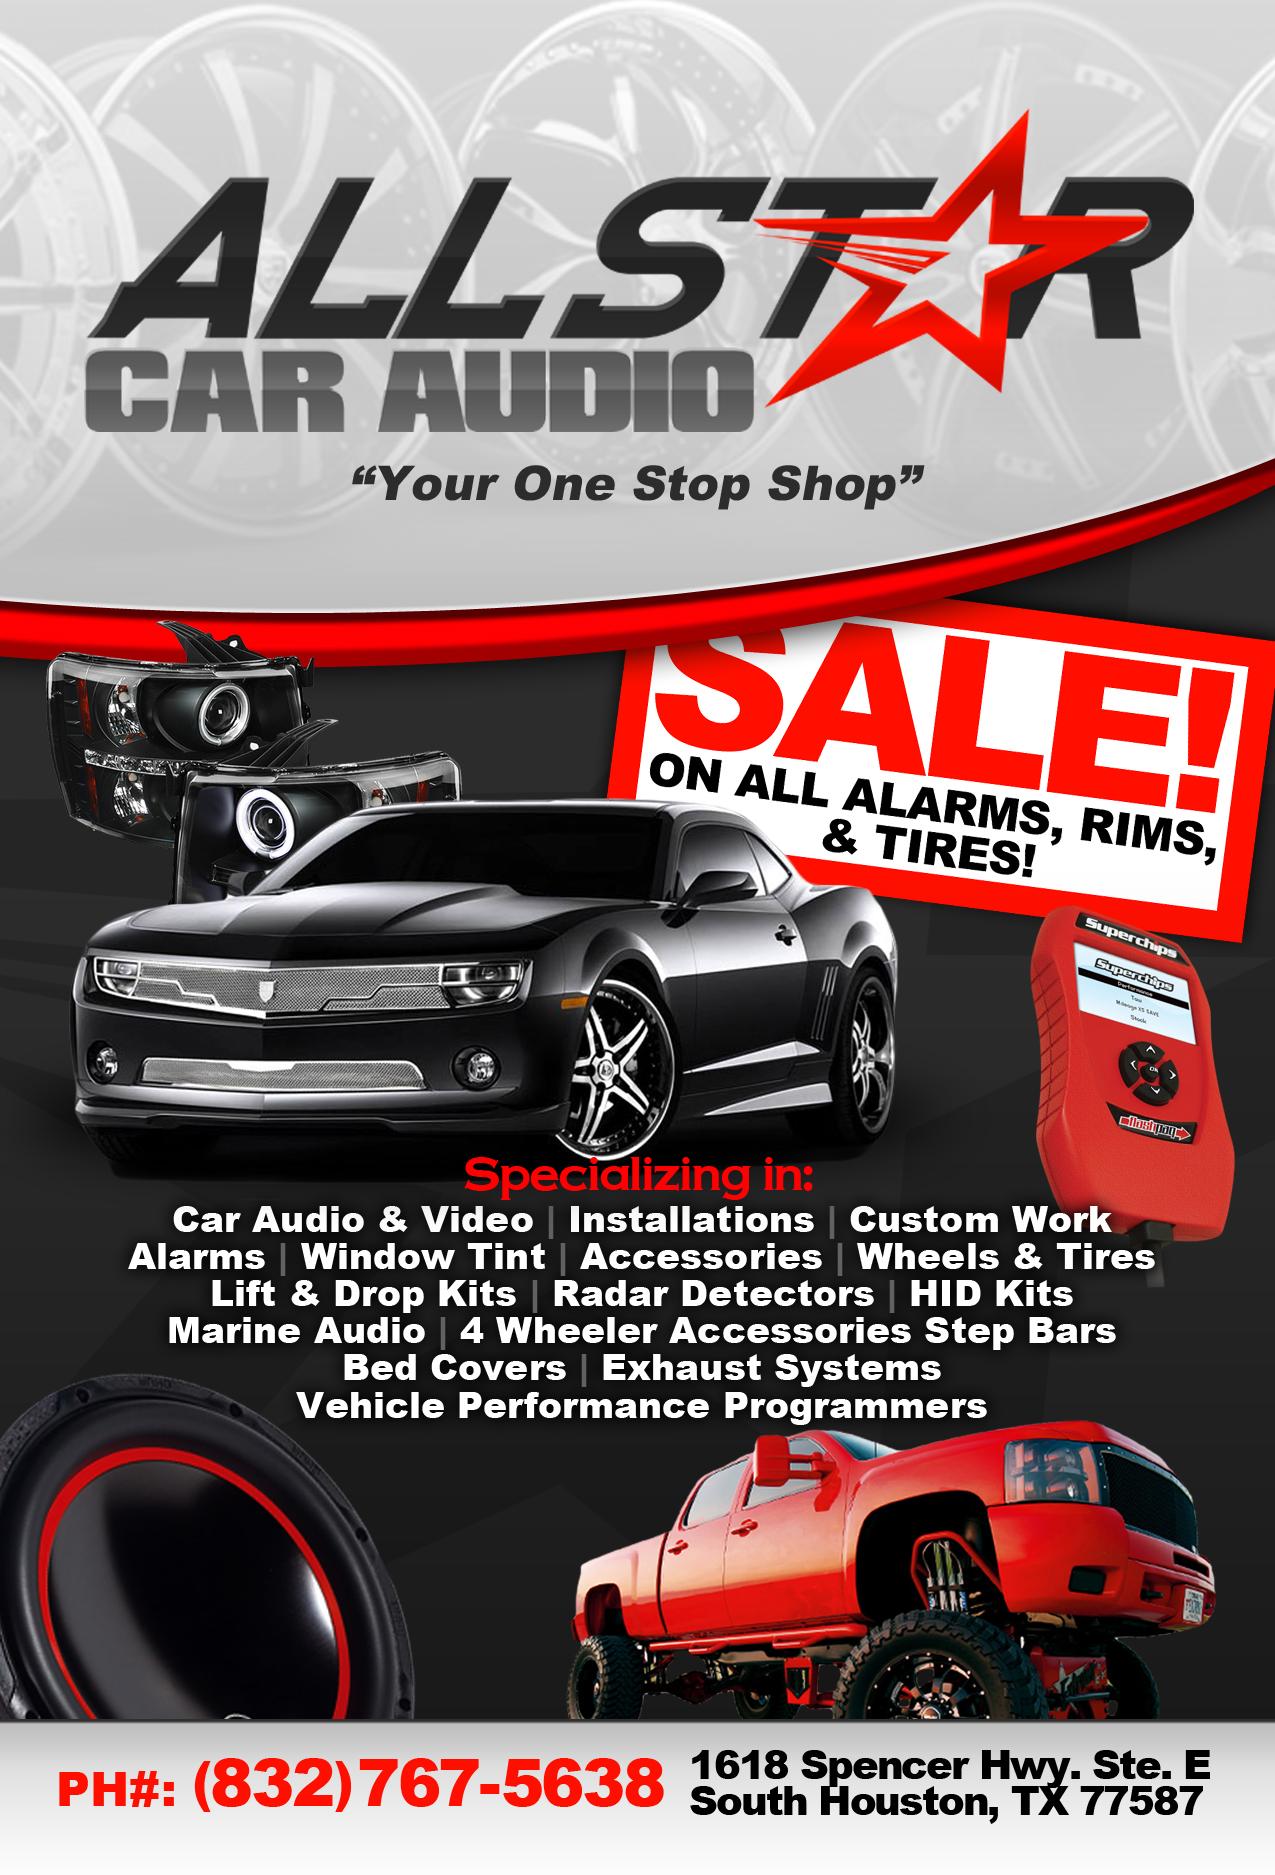 All Star Car Audio 1618 Spencer Hwy South Houston Tx